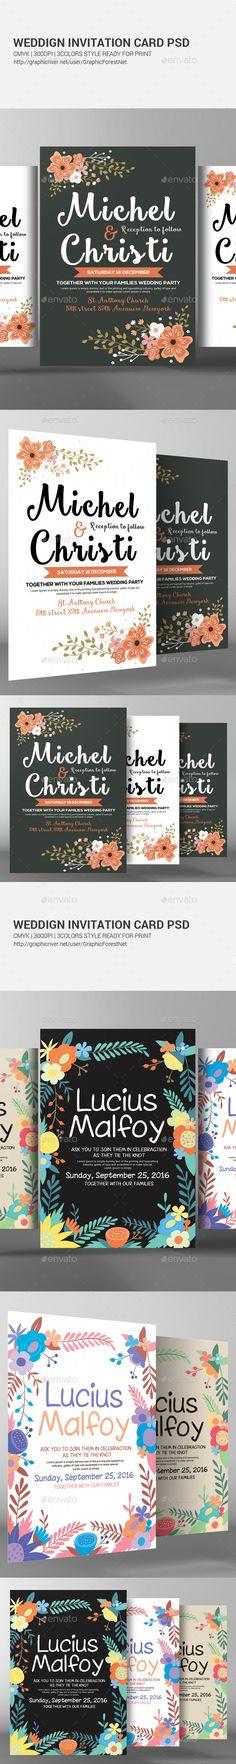 Wedding Invitation Card Design Bundle - Weddings Cards & Invite Template PSD. Download here: http://graphicriver.net/item/wedding-invitation-cards-bundle/16893222?s_rank=33&ref=yinkira